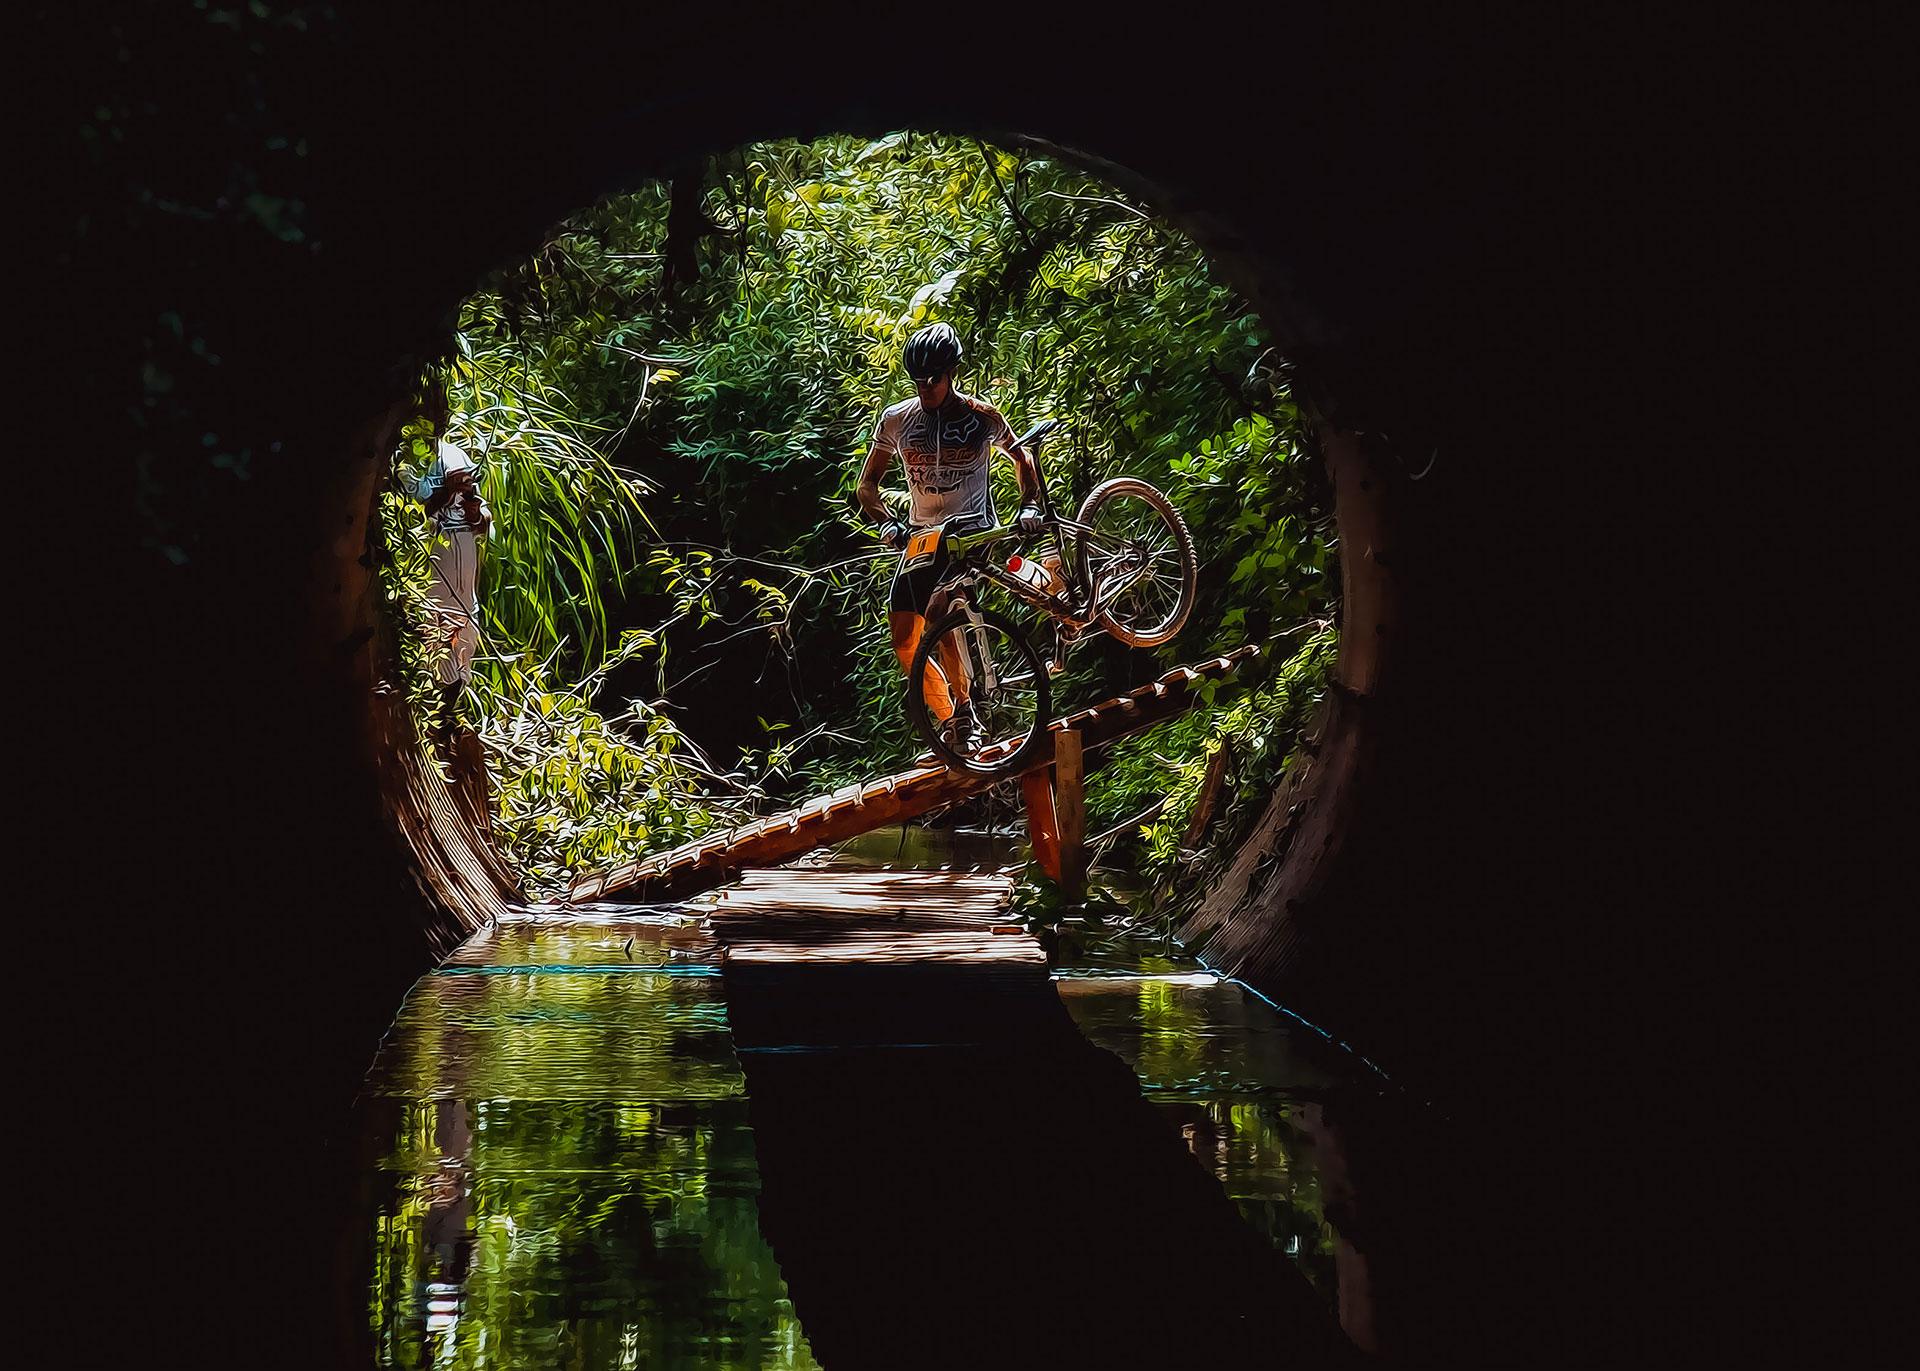 xterra, bike, evento outdoor, sportsession, cobertura fotográfica, agência fotografica, sporte outdoor, montain bike, triathlon